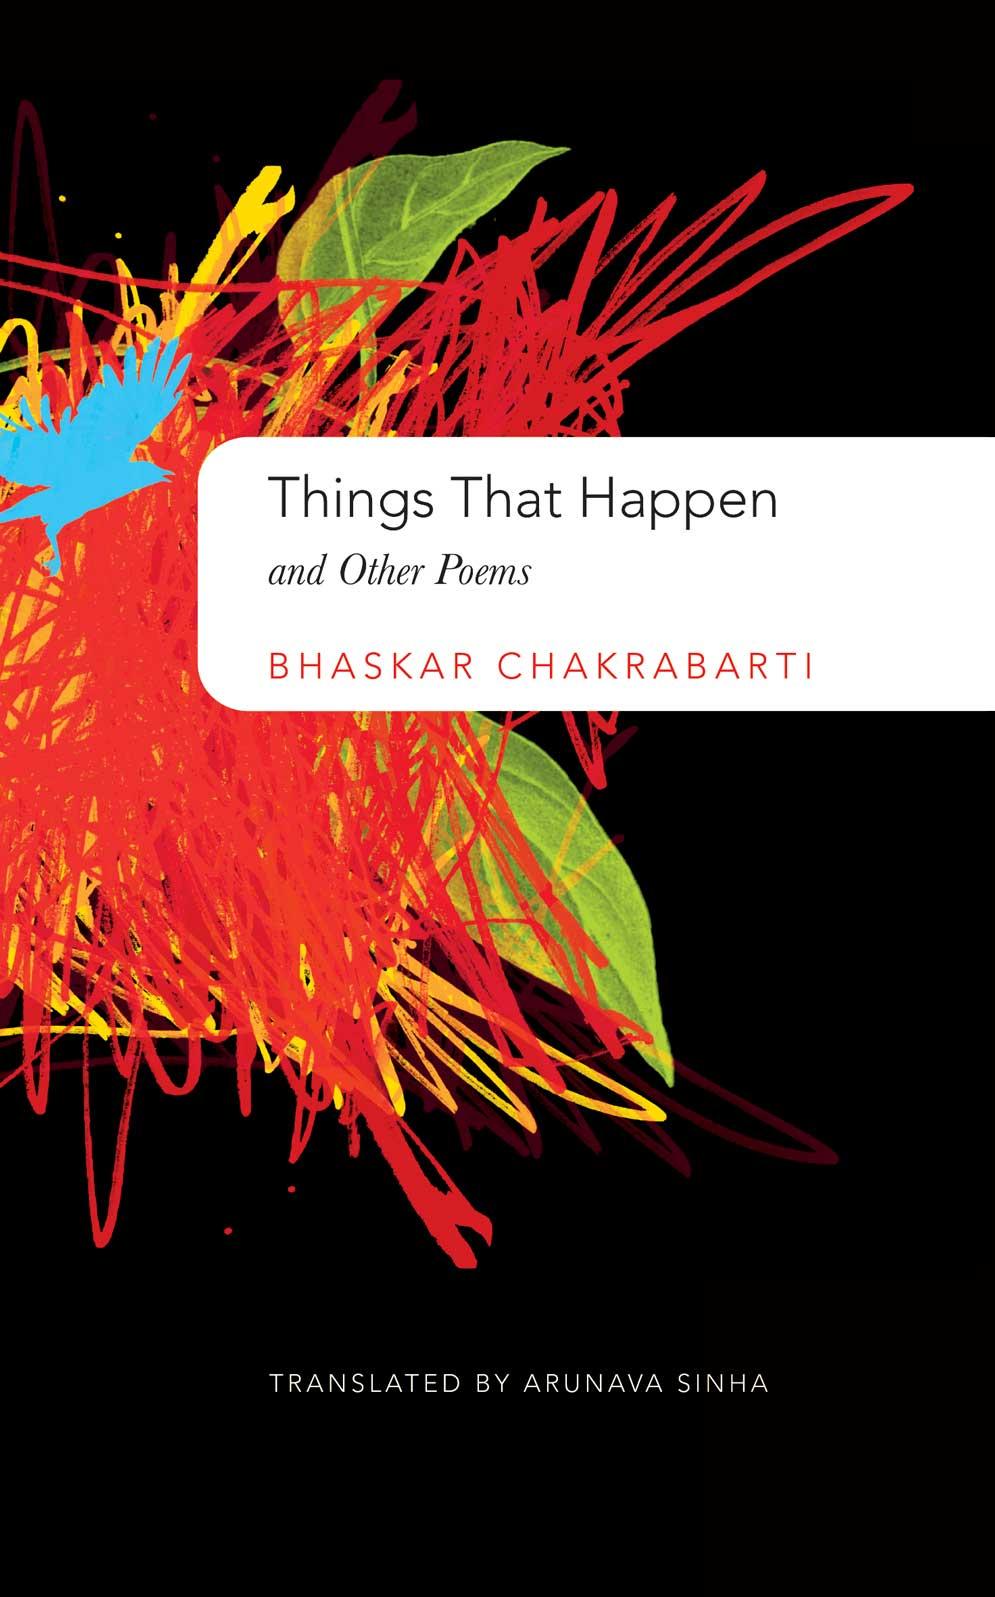 Things that Happen by Bhaskar Chakrabarti  |  Seagull Books